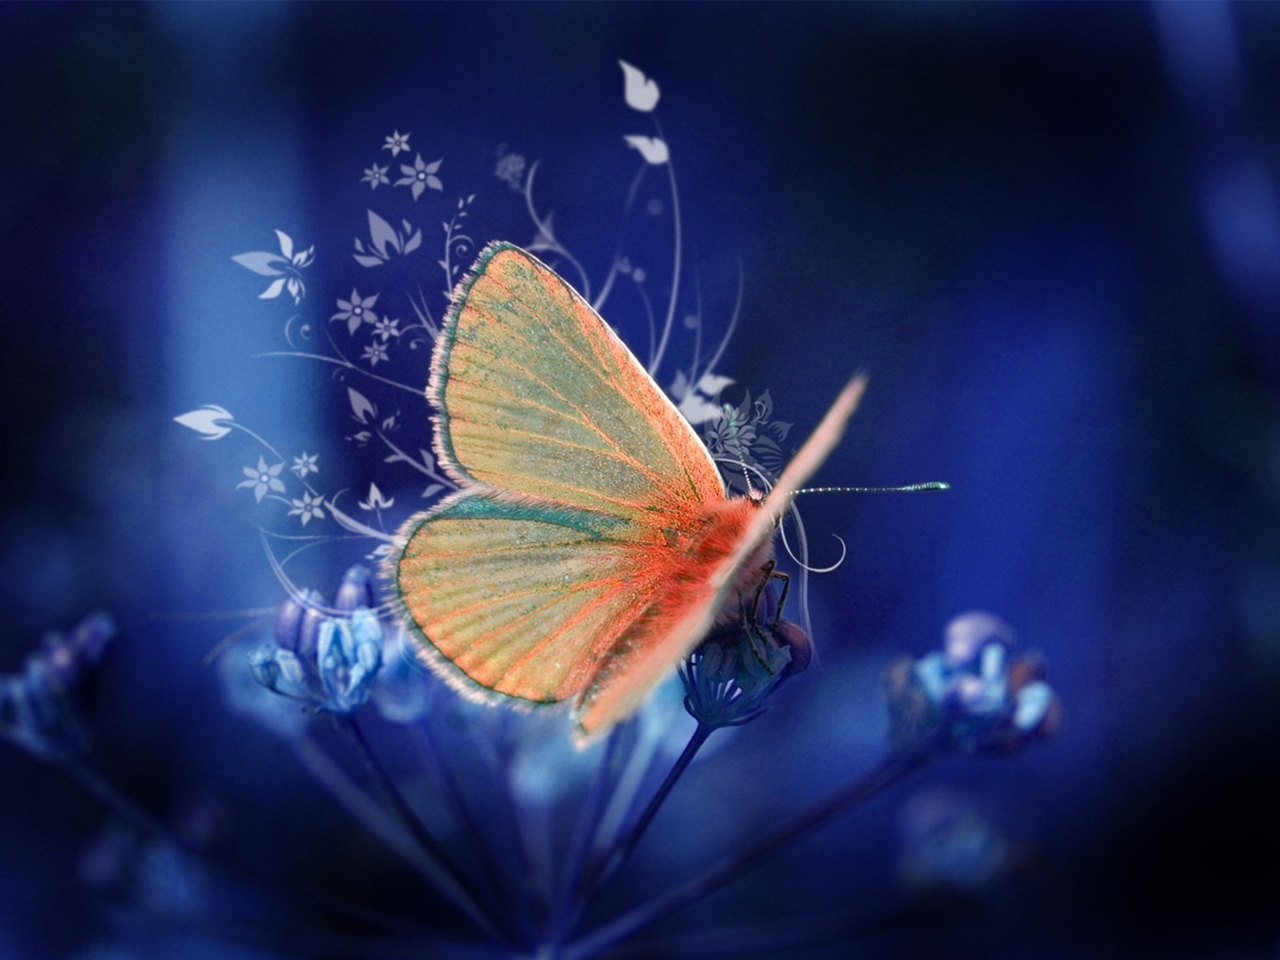 Pictures of butterflies 03